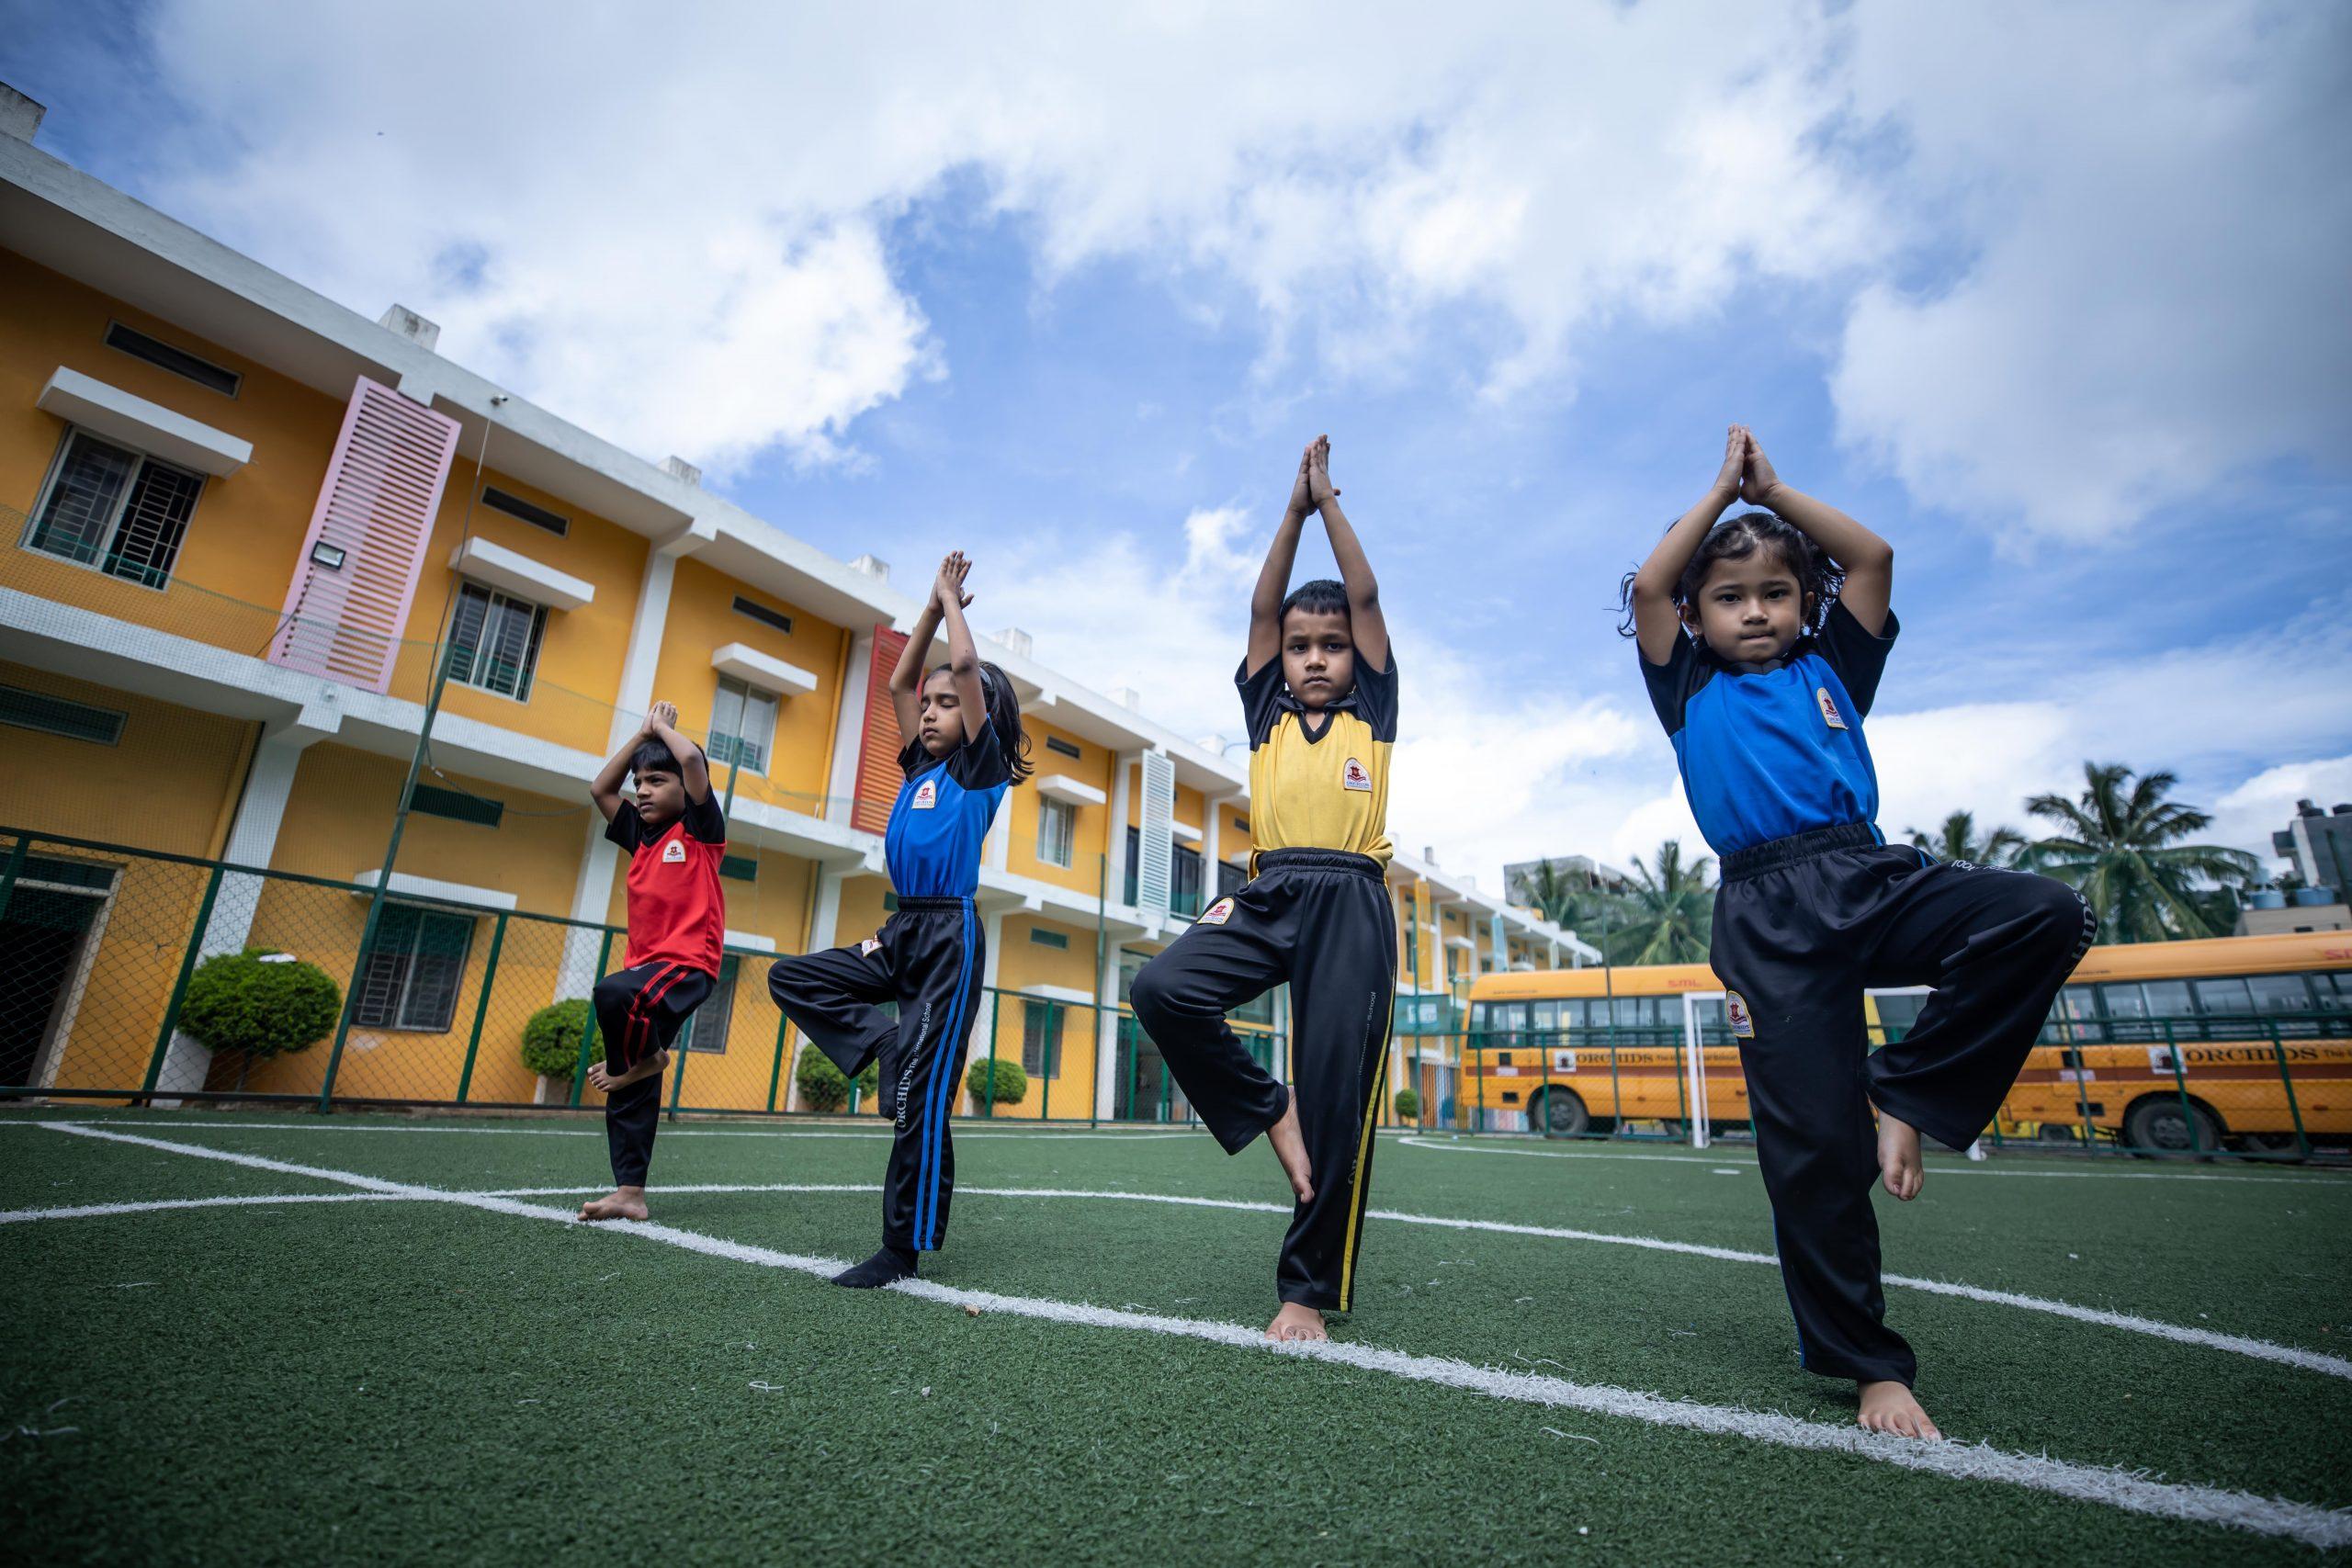 Benefits of yoga for kids -  help build self esteem - Orchids